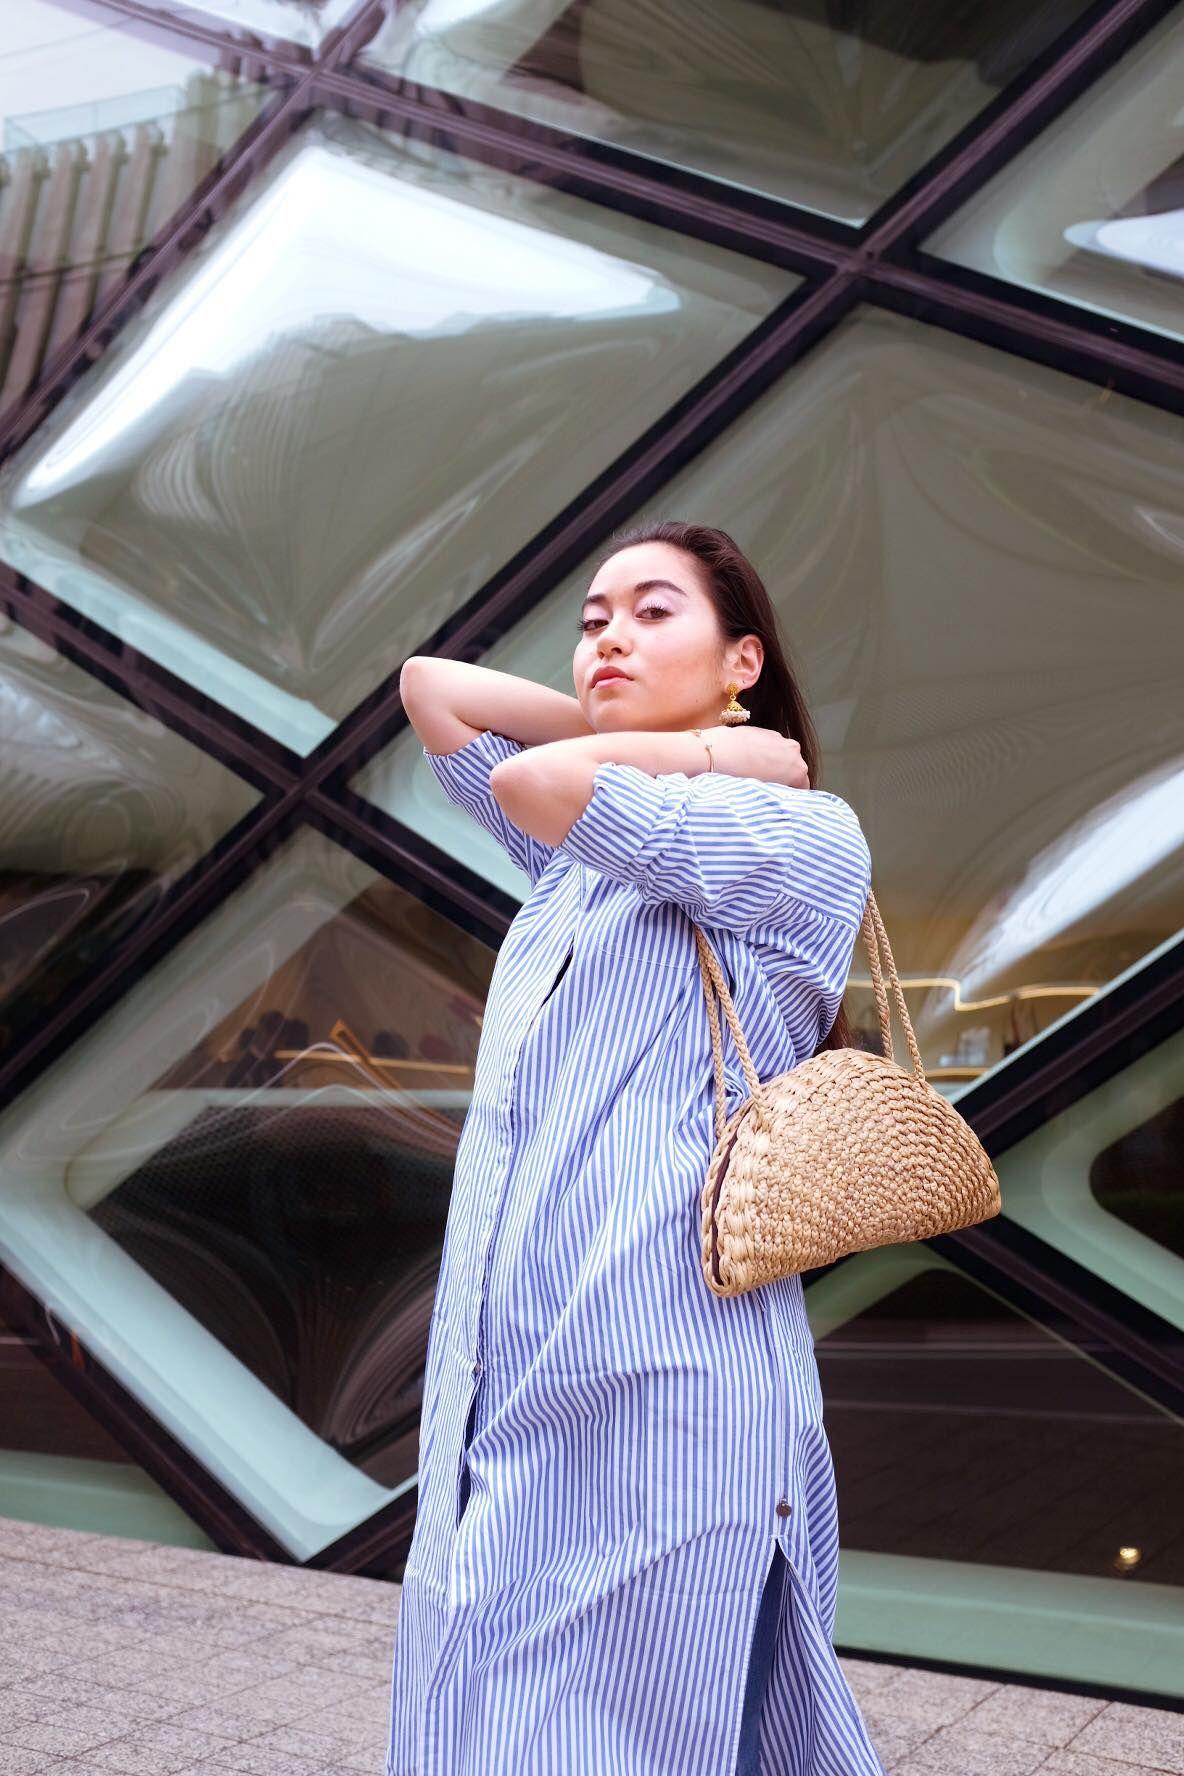 Tokyo Fashion, Prada Shop, Omotesando ©Blaastyle